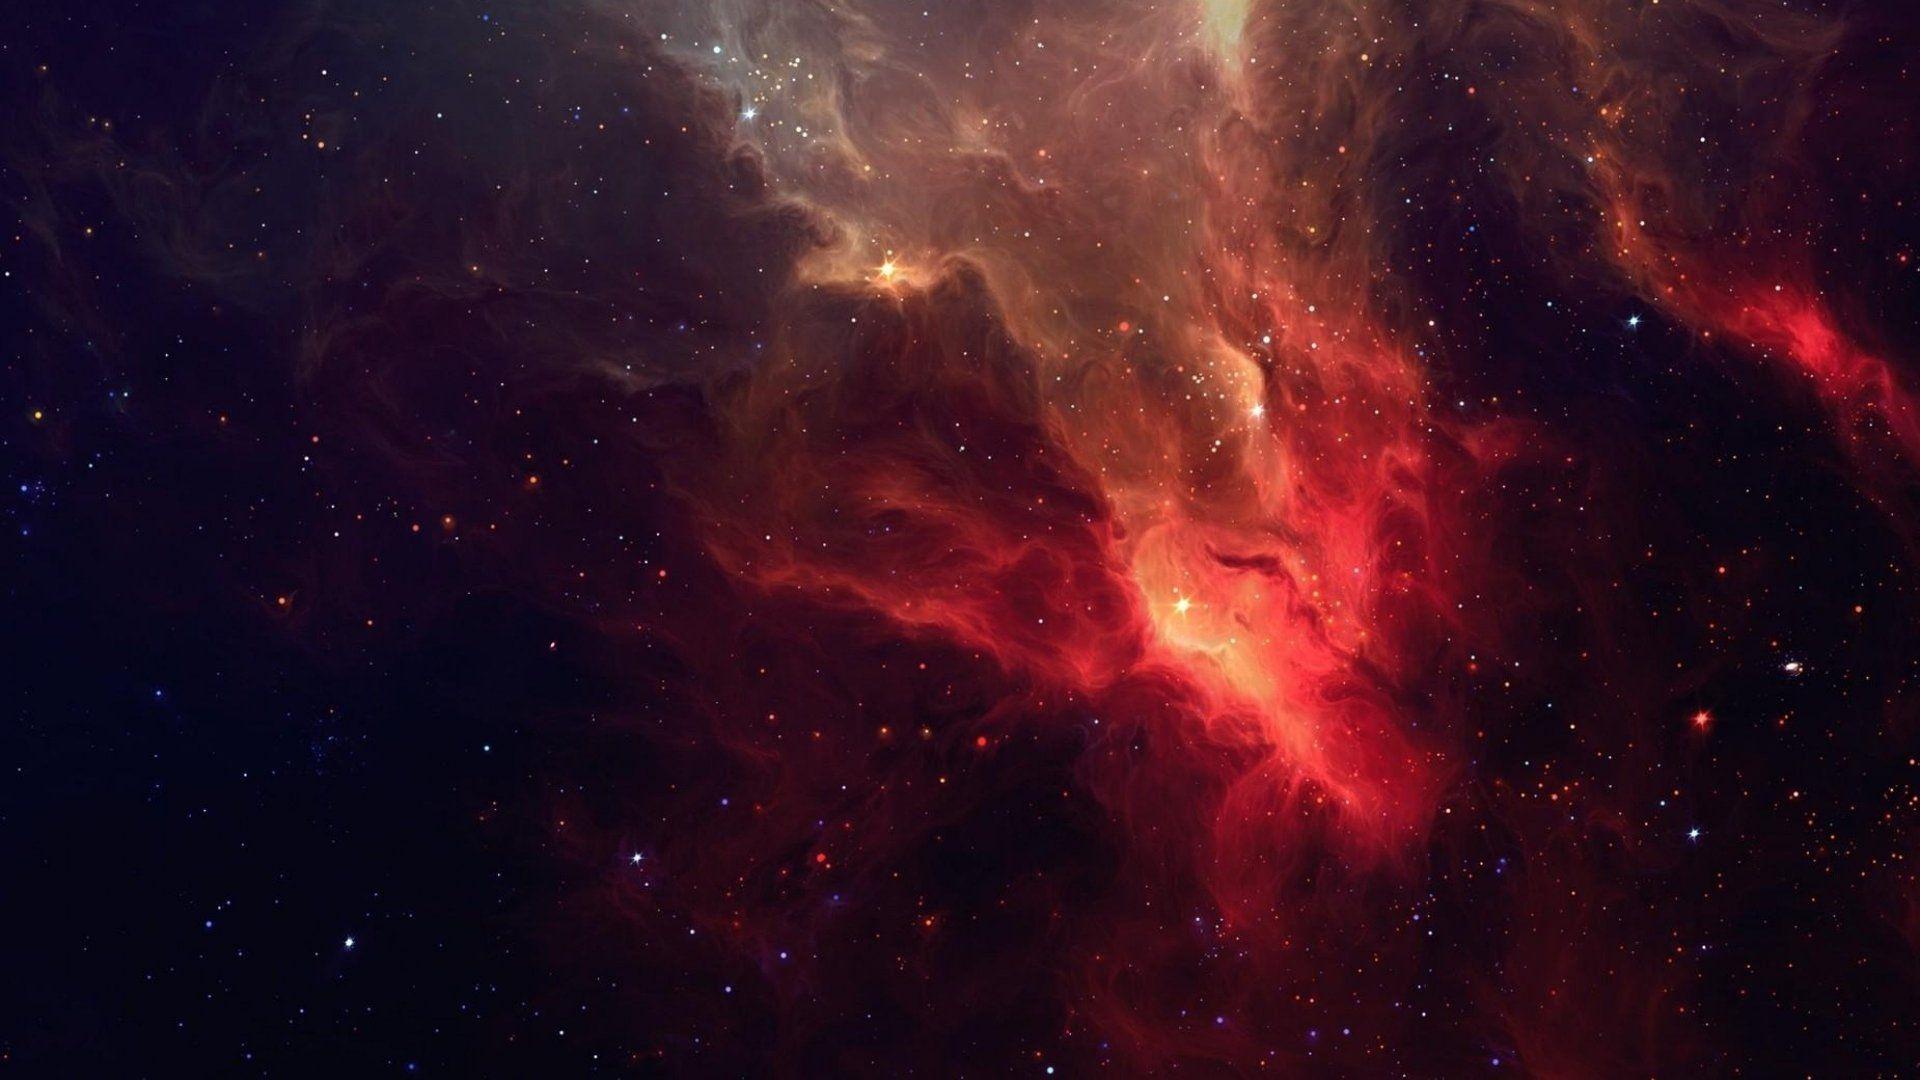 sci_fi_futuristic_art_artwork_artistic_original_science_fiction_3840x2160.jpg